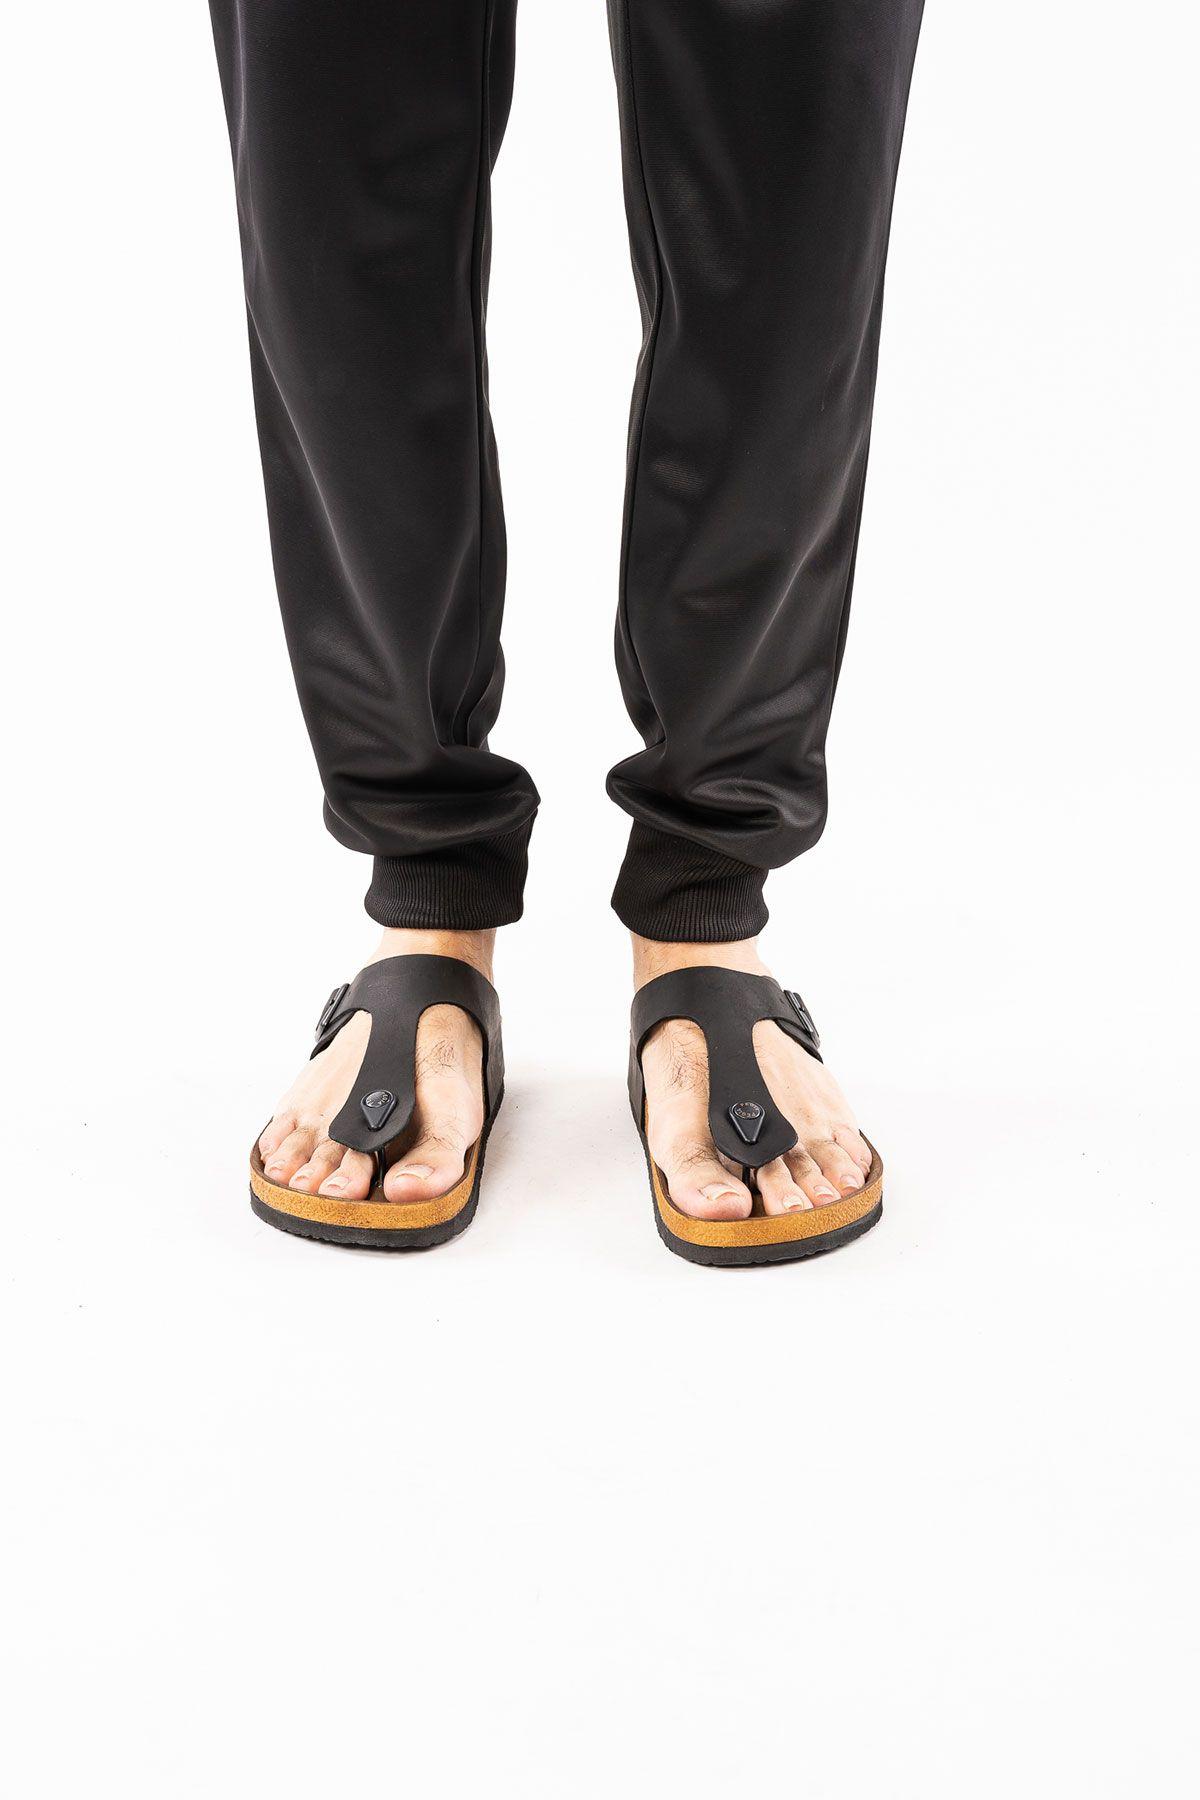 Pegia Genuine Leather Men's Slippers 215011 Black